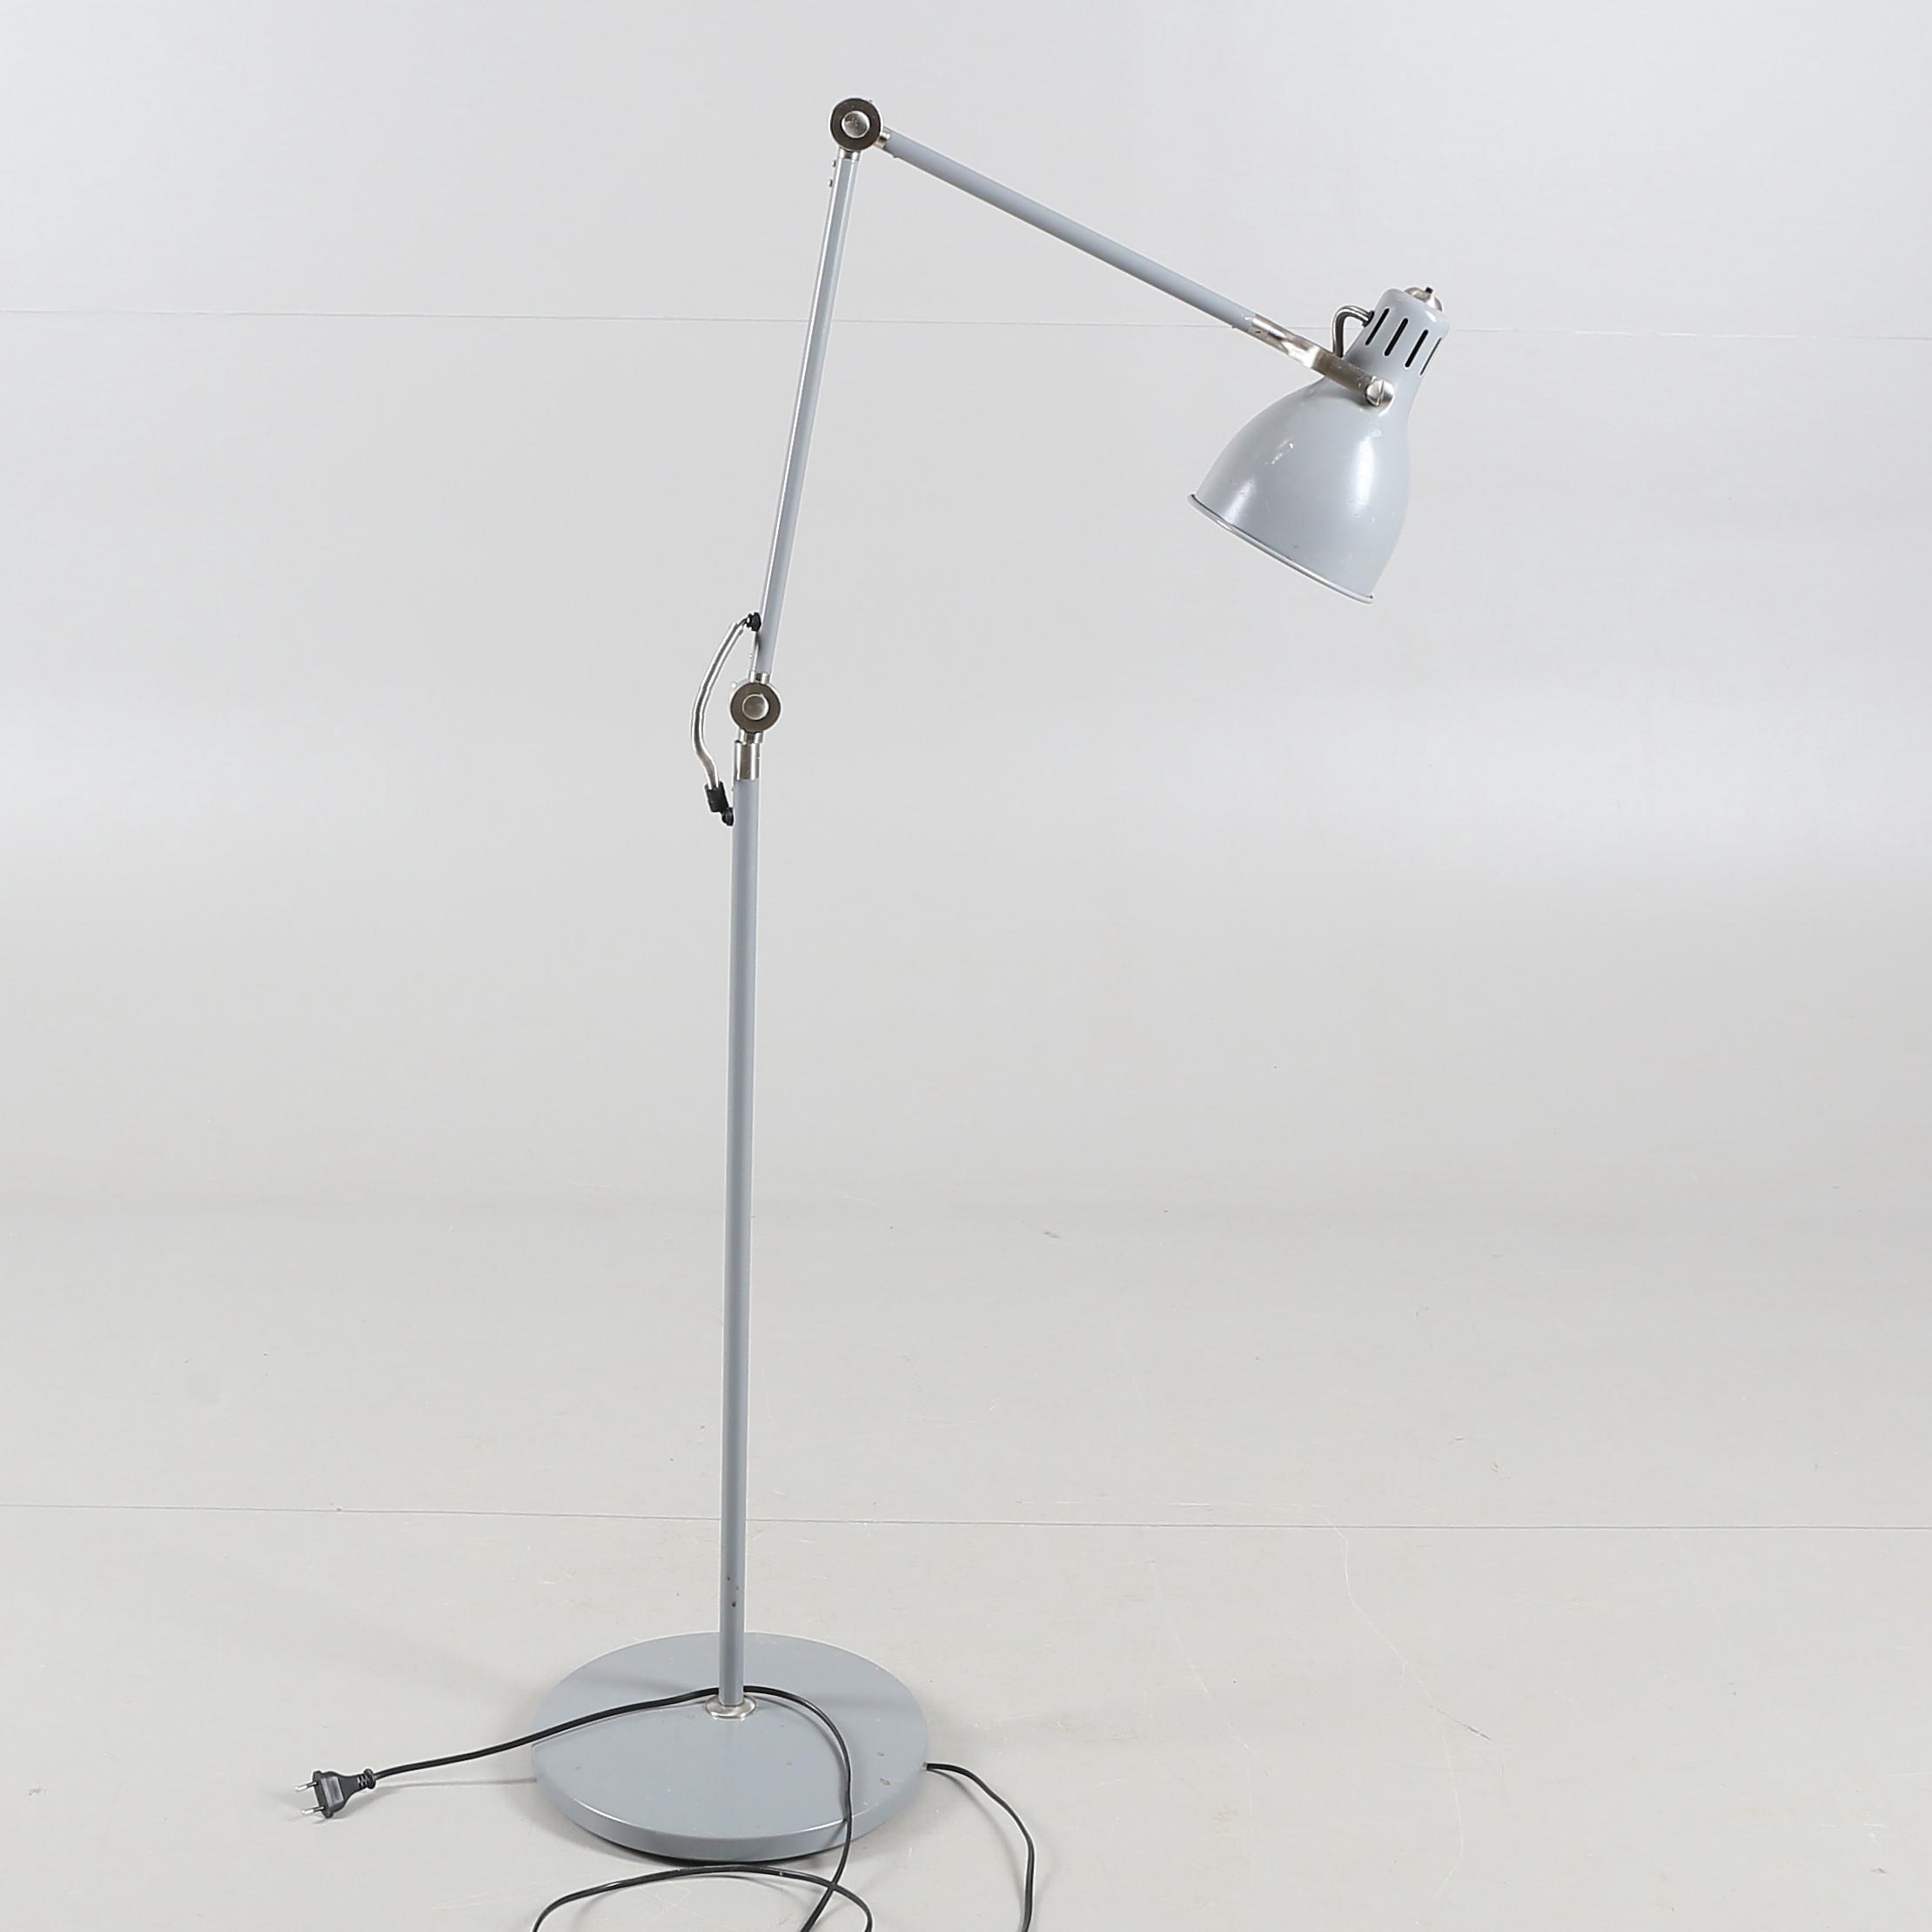 Golvlampa Stal Aluminium Arod Ikea 2000 Tal Lighting